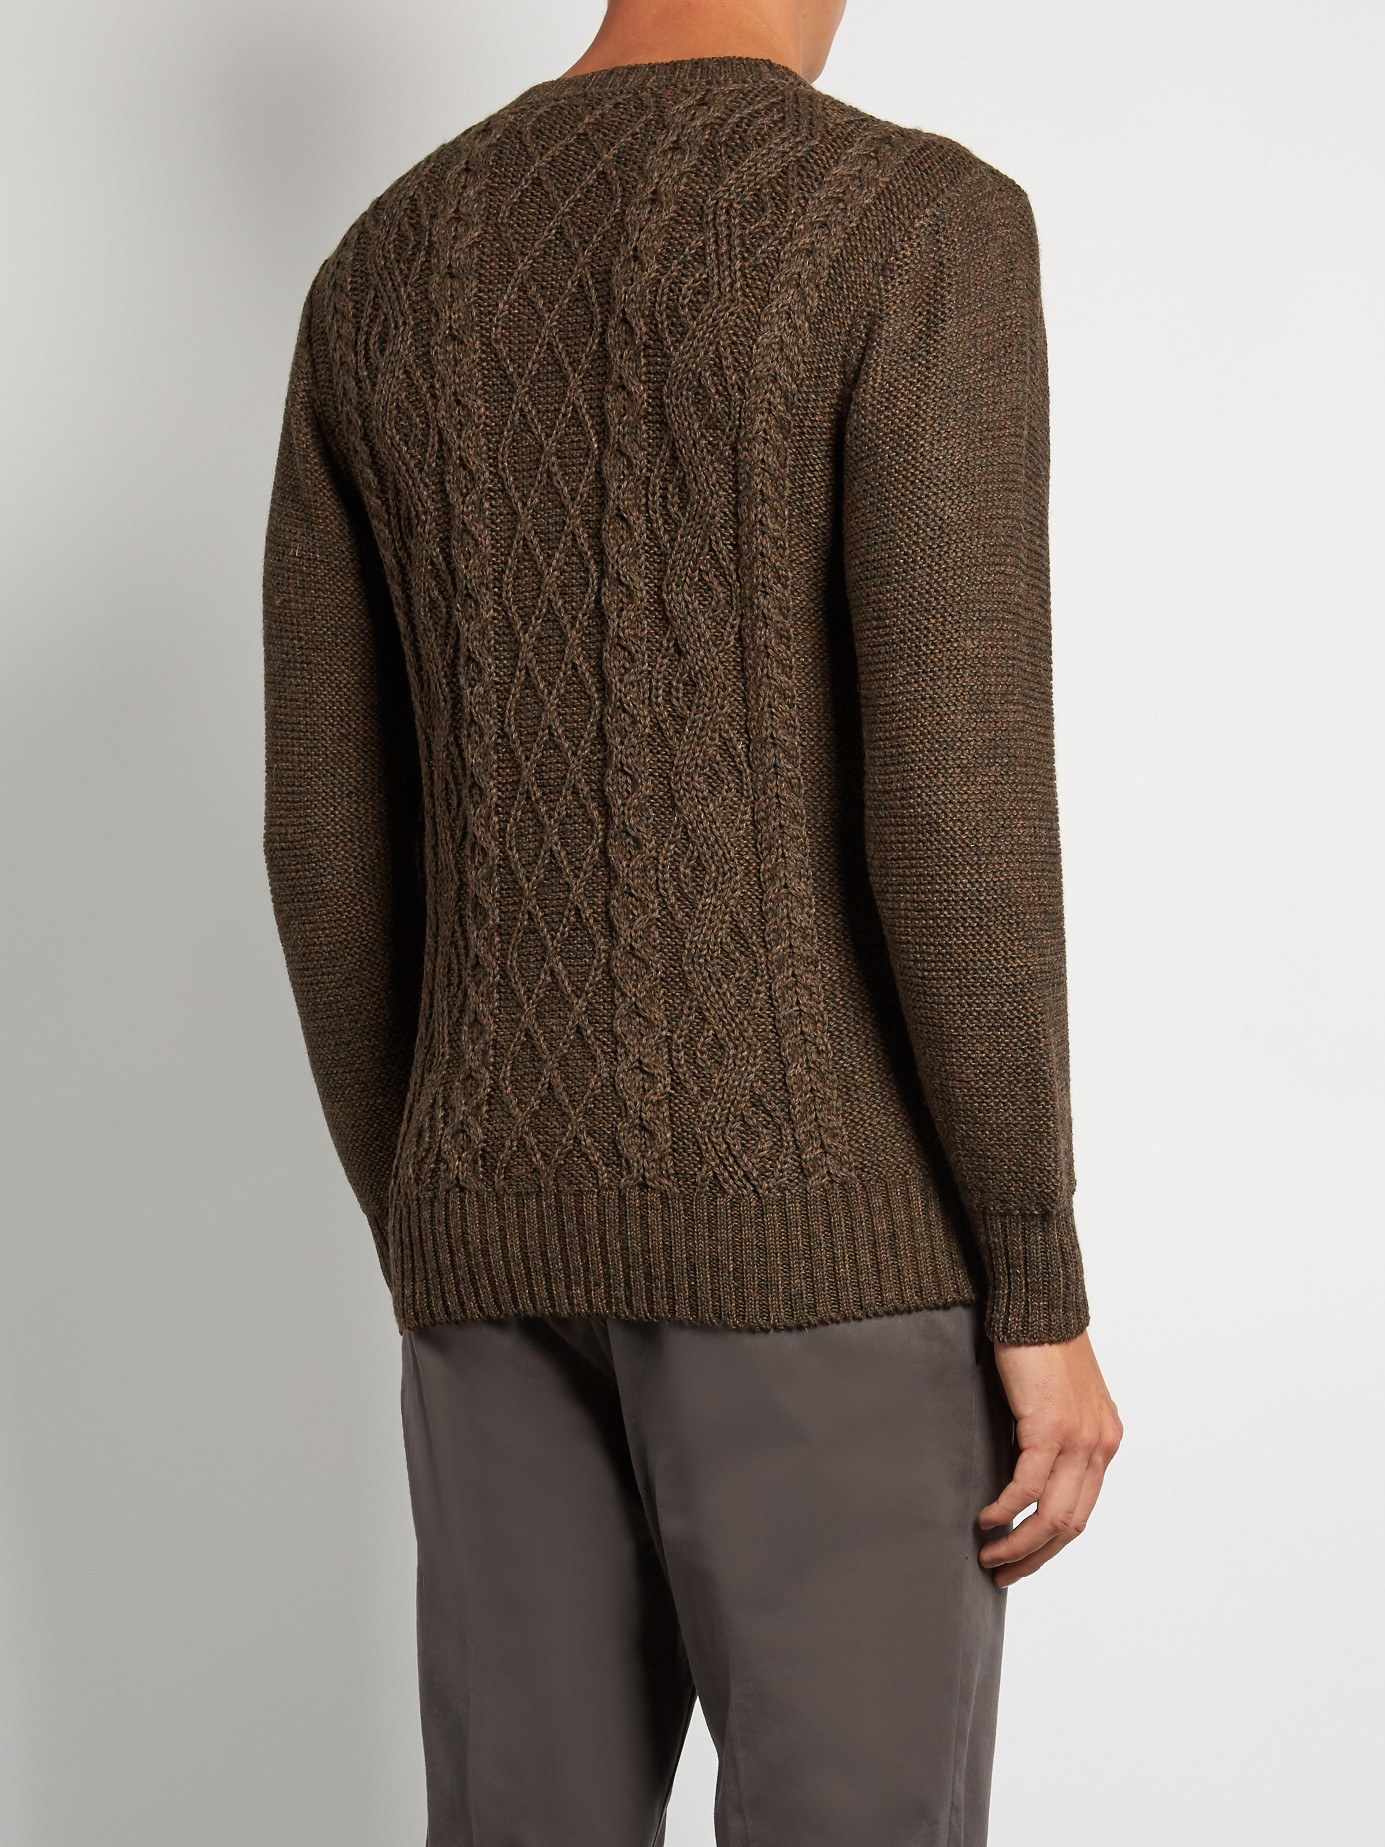 Alpaca Aran Knitting Pattern : Inis meain Aran-knit Alpaca And Silk-blend Sweater in ...